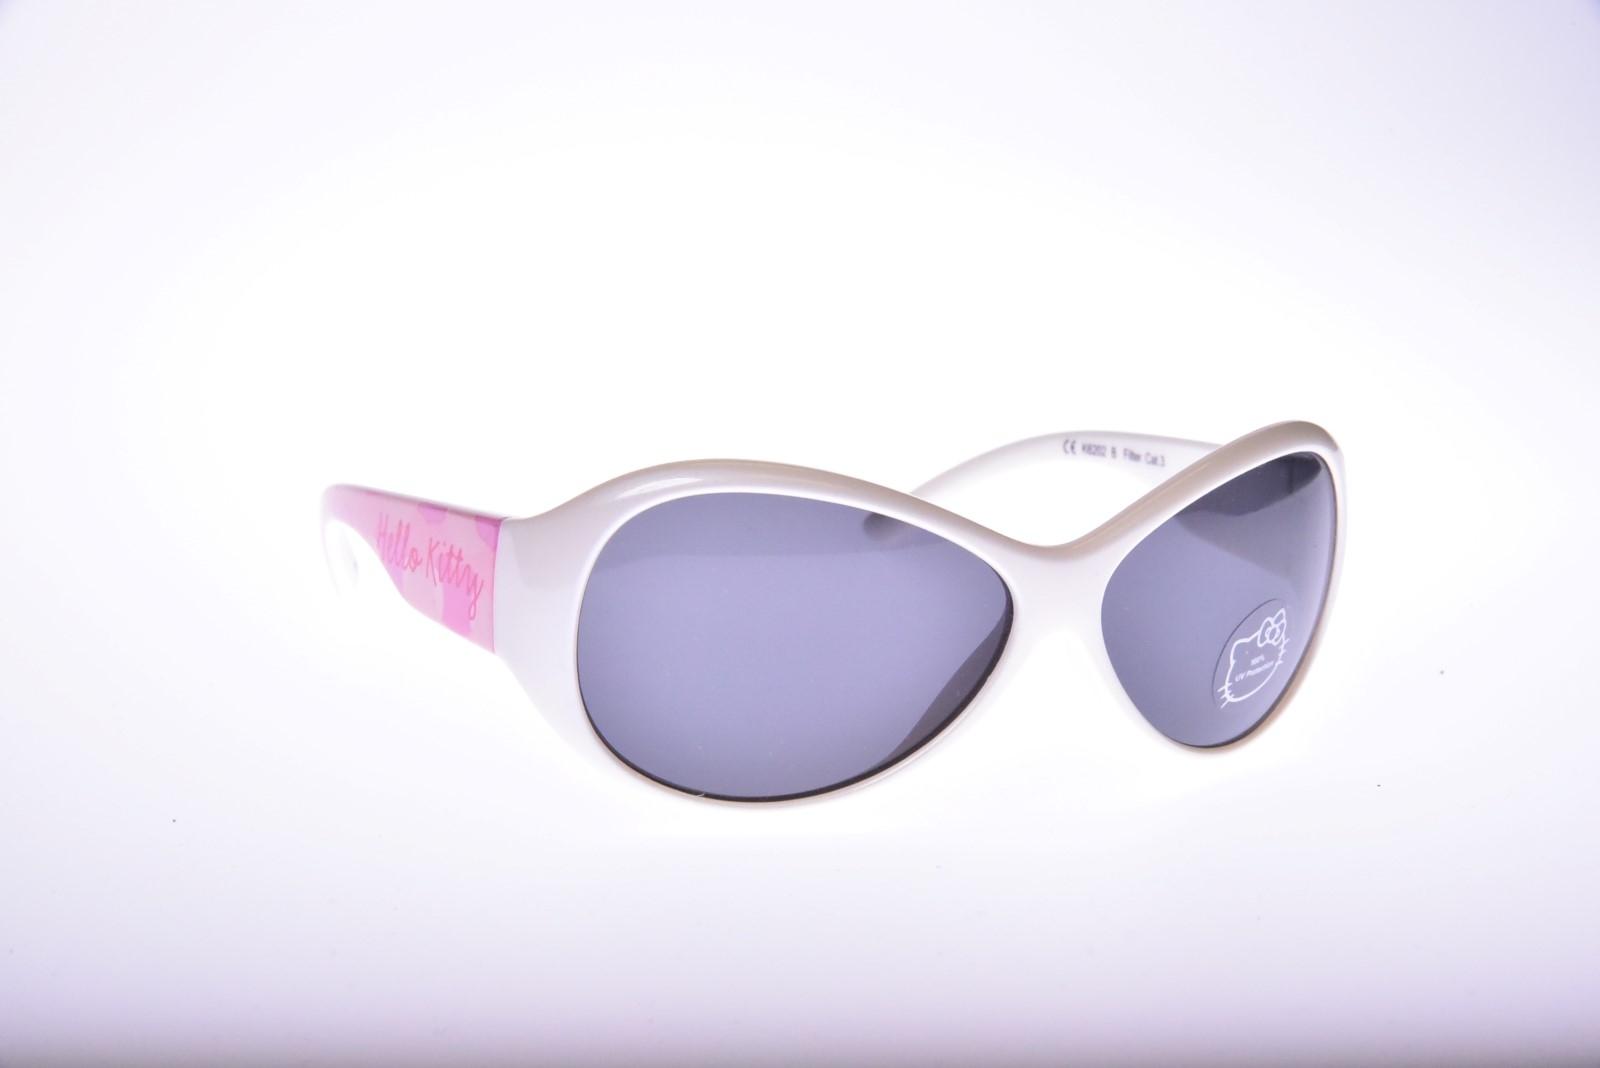 Polaroid Hello Kitty K6202B - Slnečné okuliare pre deti 4-7 r.